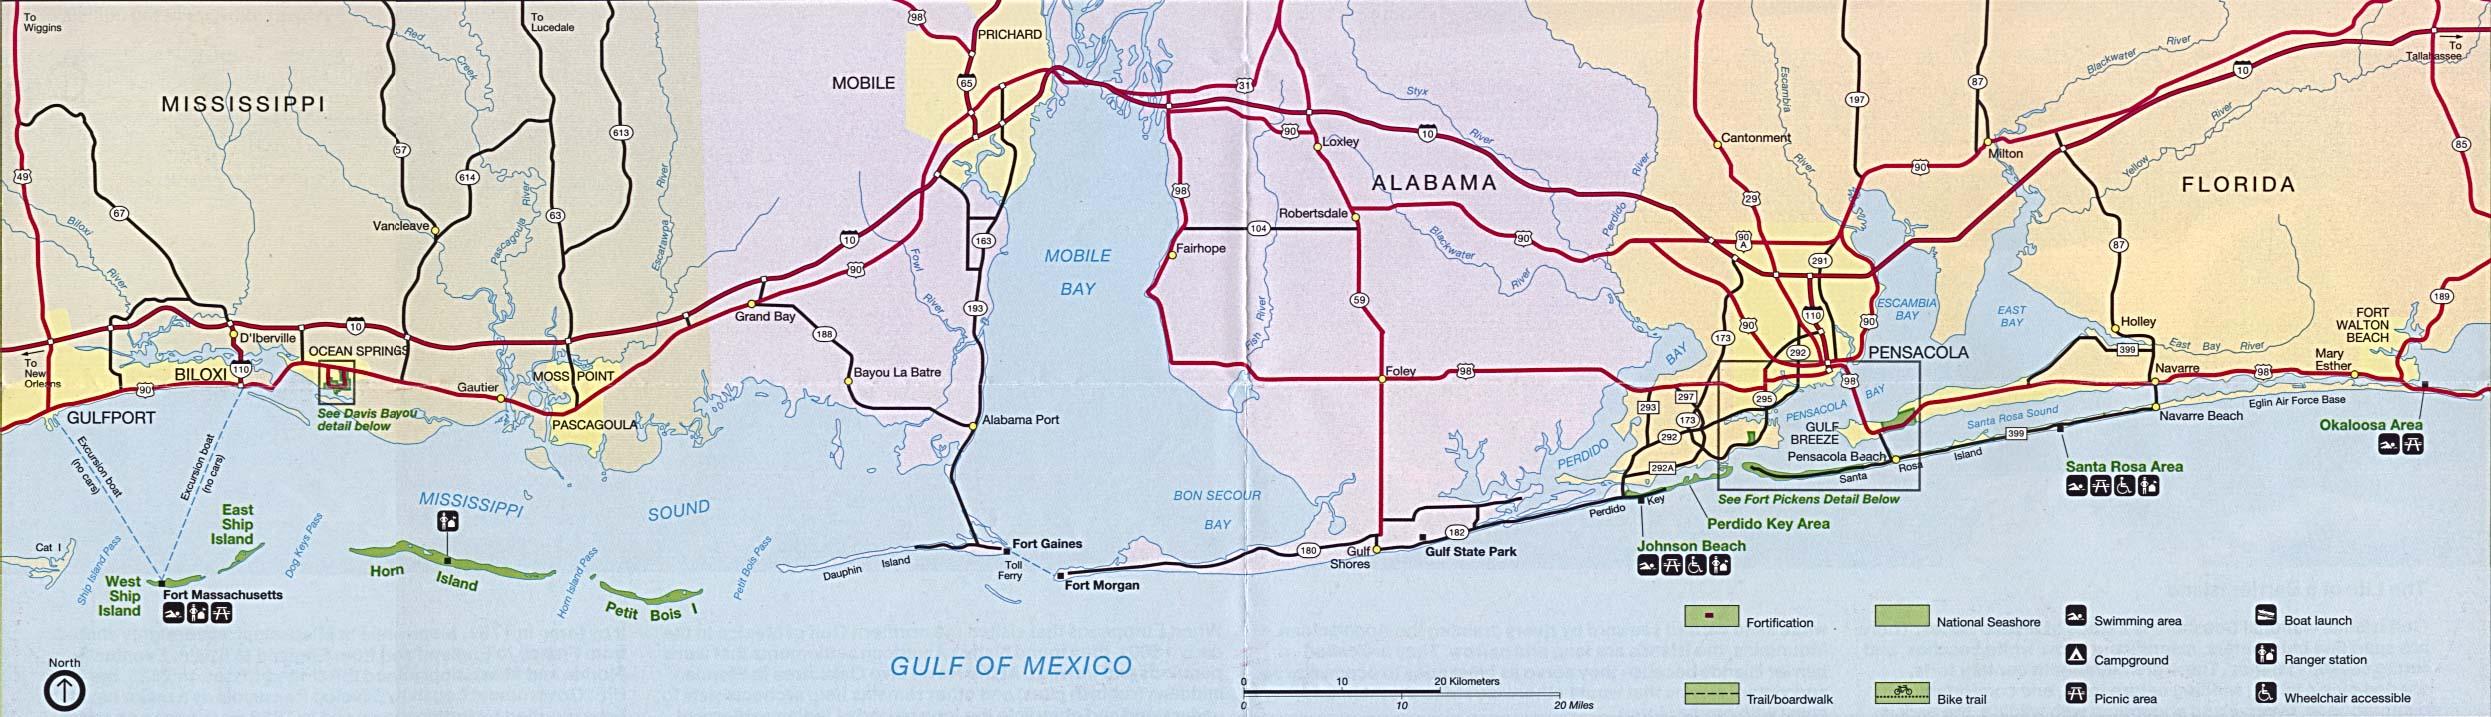 Free Download Mississippi National Park Maps